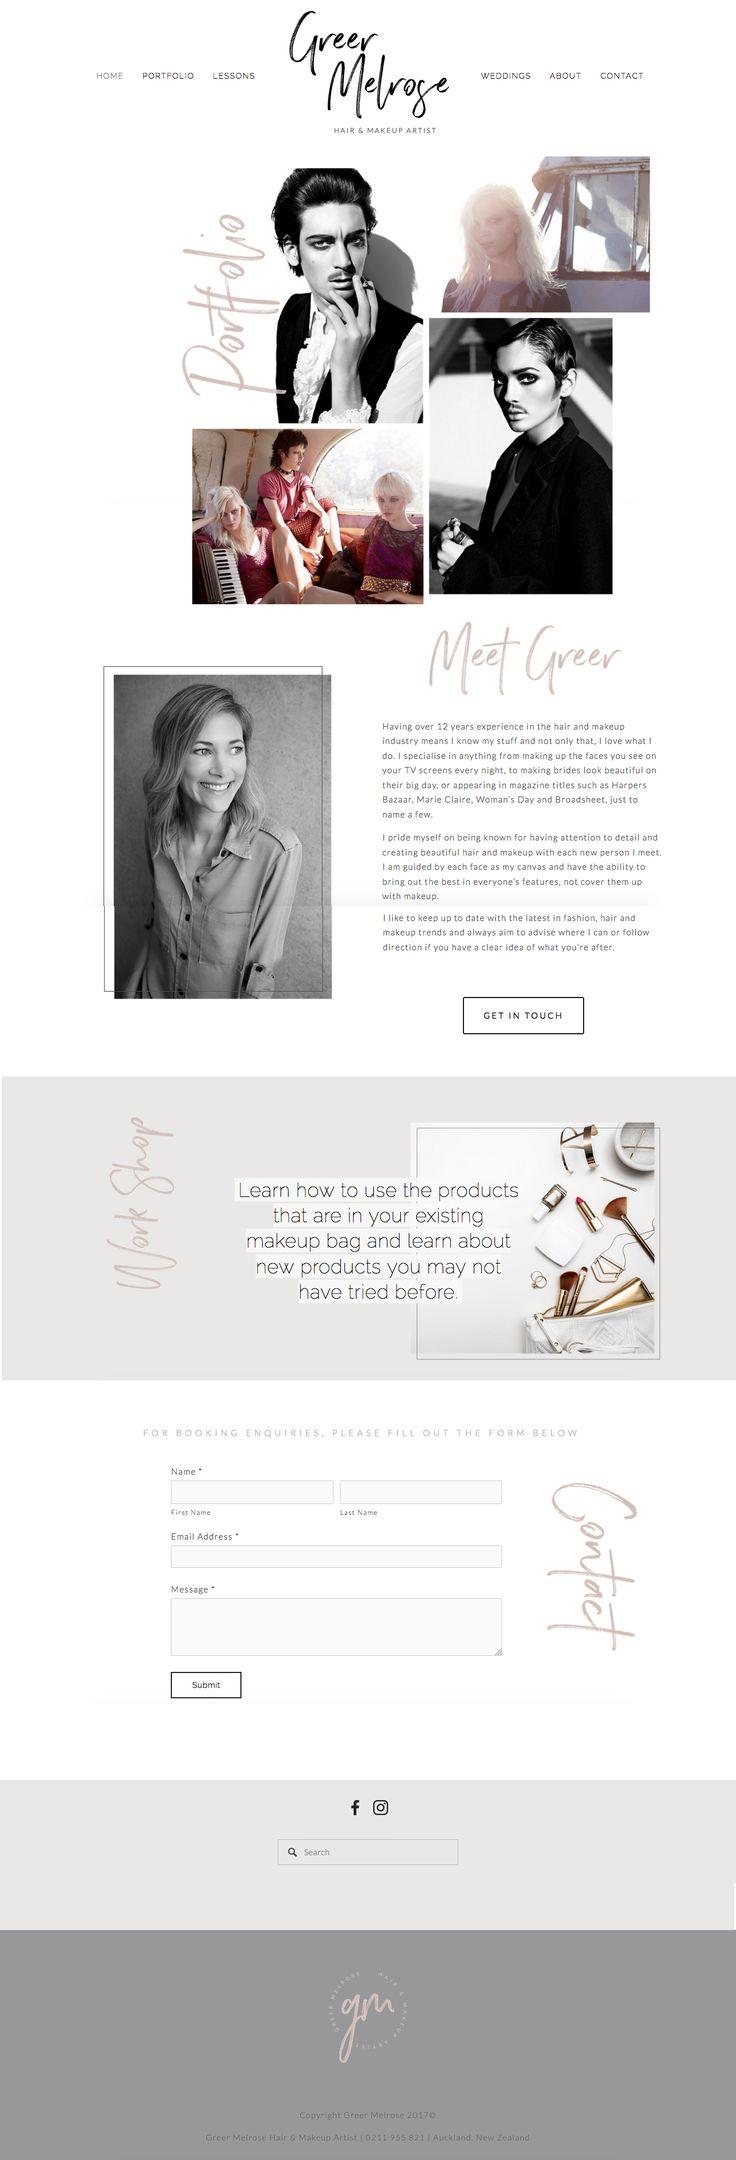 Squarespace webdesign by Polka Dot Heart Design | Makeup Artist Portfolio Website | Branding, Brand Stylist, Brand Designer, Brand Styling, Wordpress Website Design, Custom Brand design, Logo Design, Feminine brand designer, Graphic Design